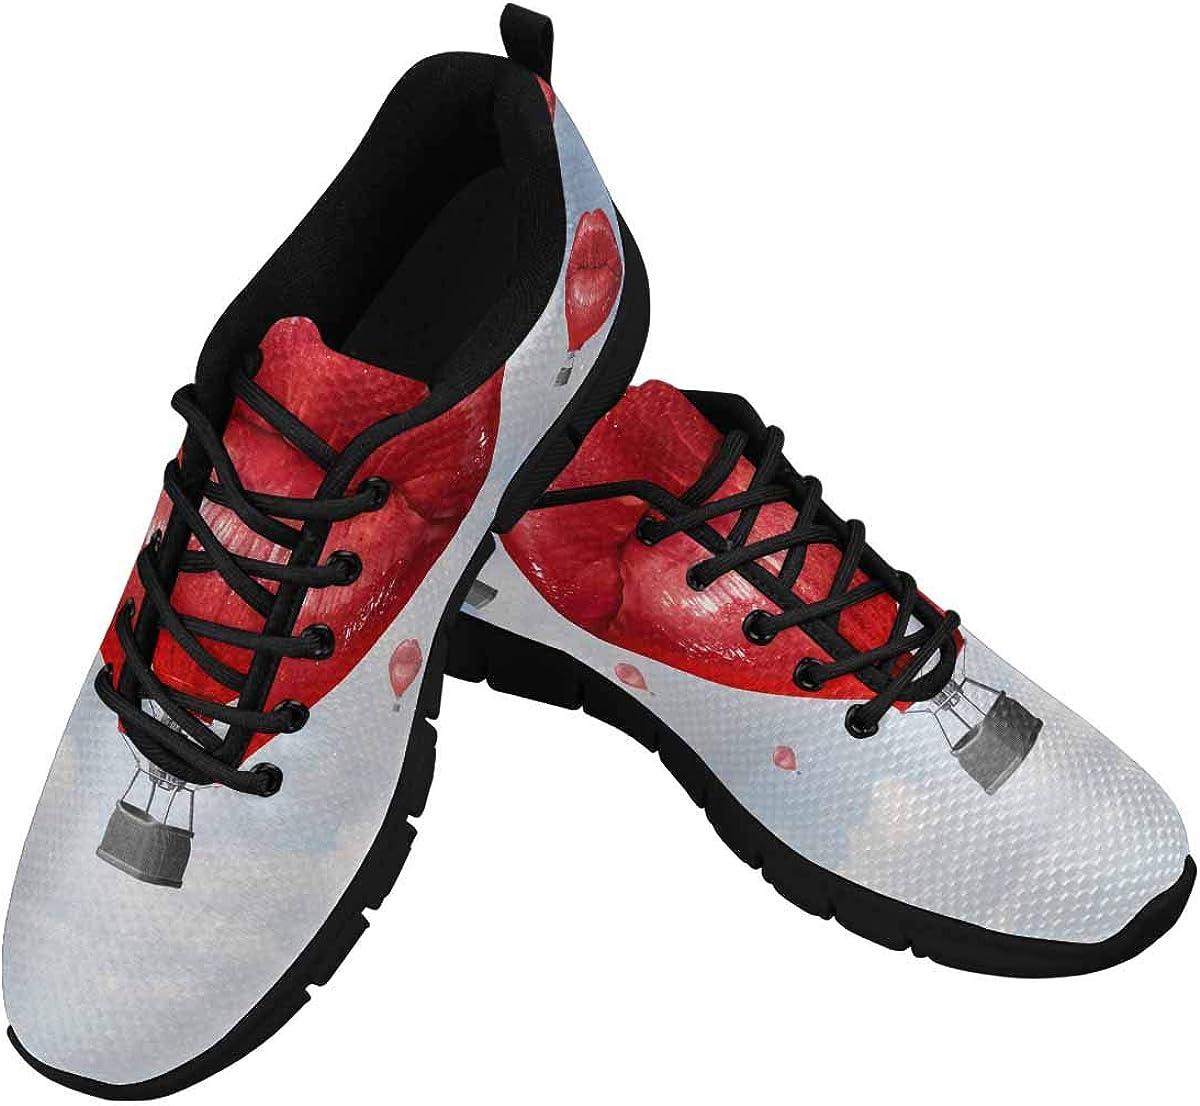 InterestPrint Love Balloons As a Hot Air Balloon Women's Athletic Walking Shoes Breathe Comfort Mesh